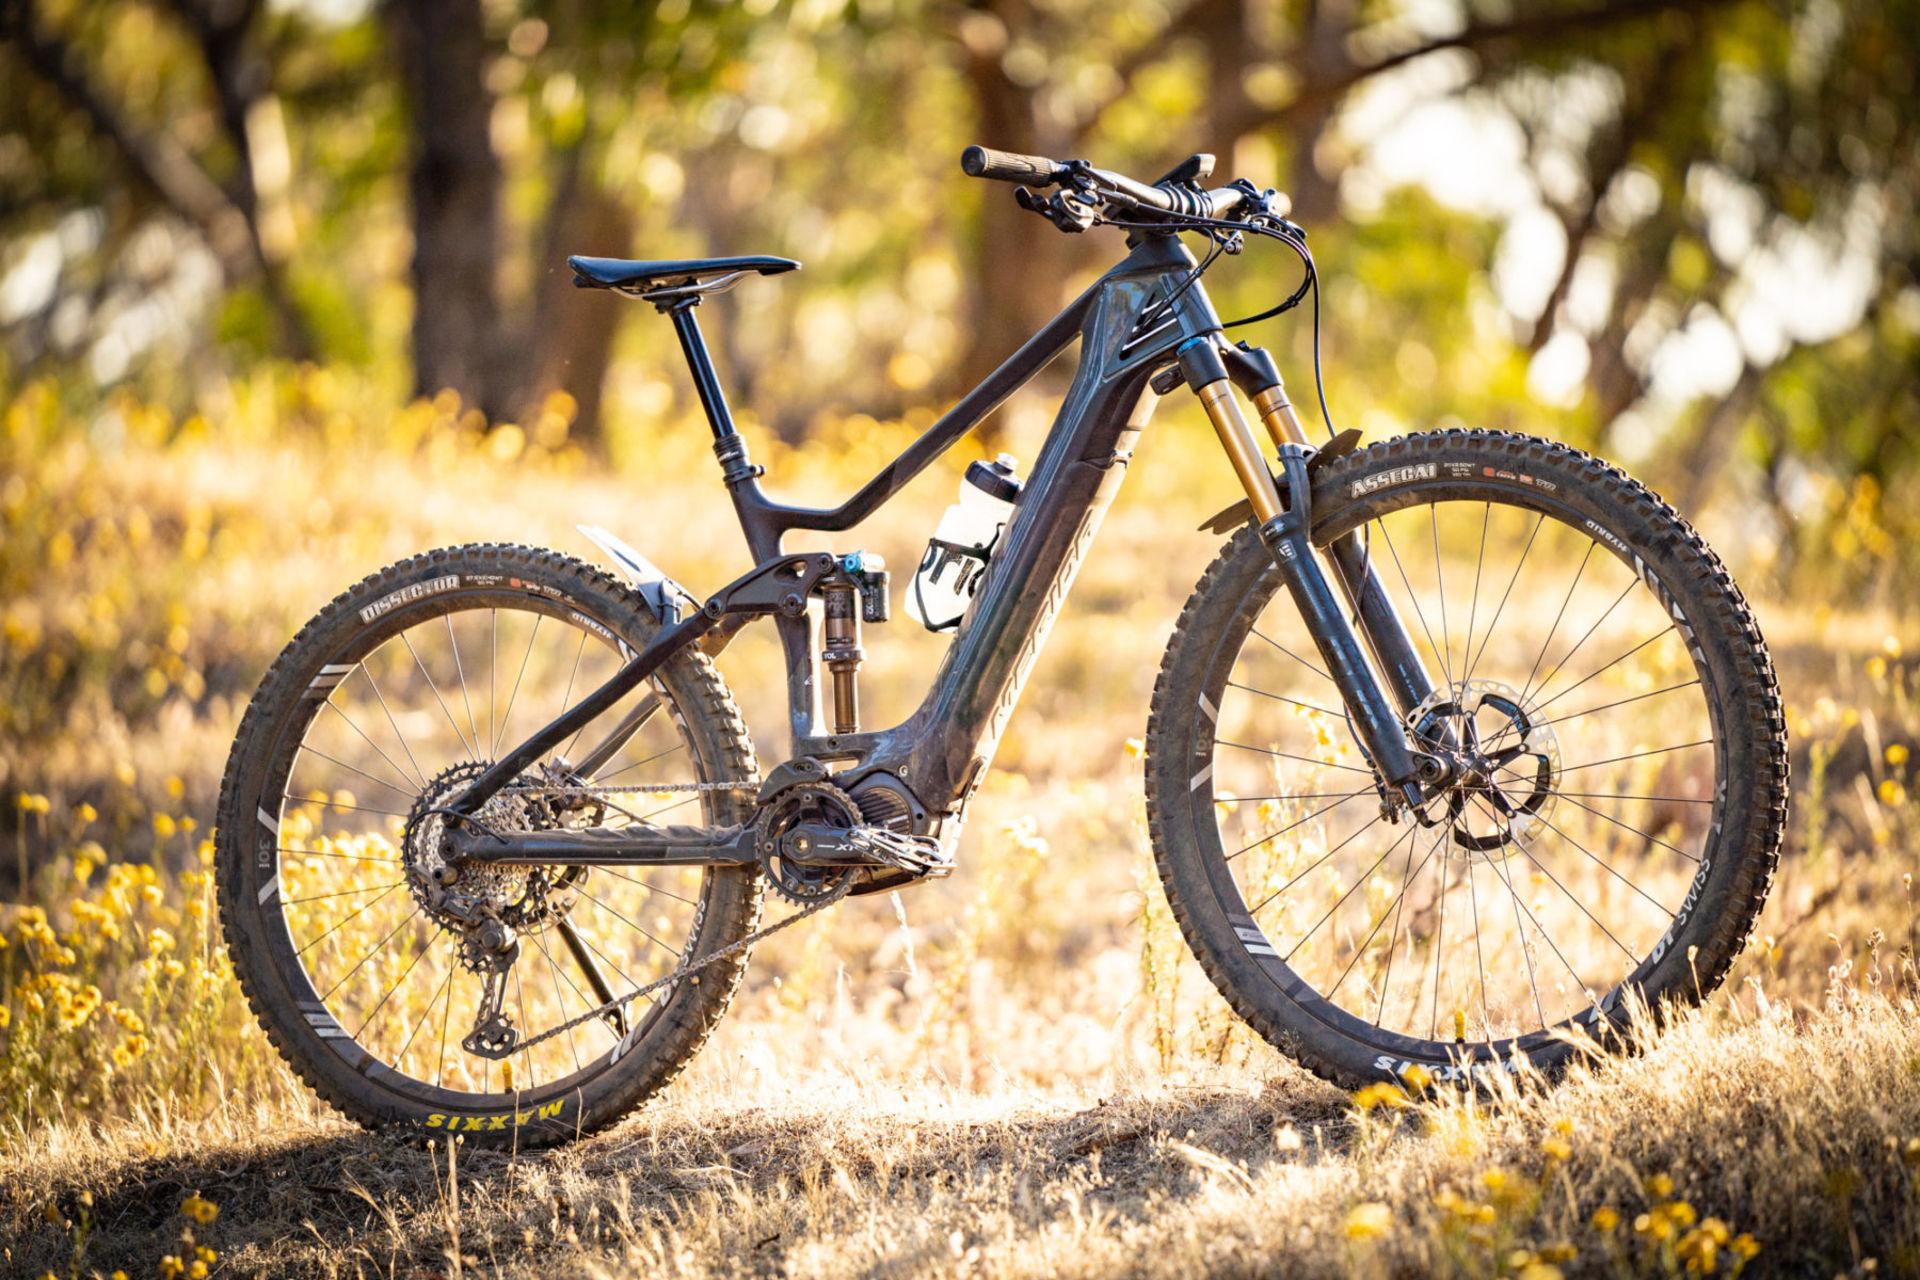 merida, flow mountain bike magazine, eone sixty, electric mountain bike, mtb, ebike, full suspension, merida and norco, review, carbon,